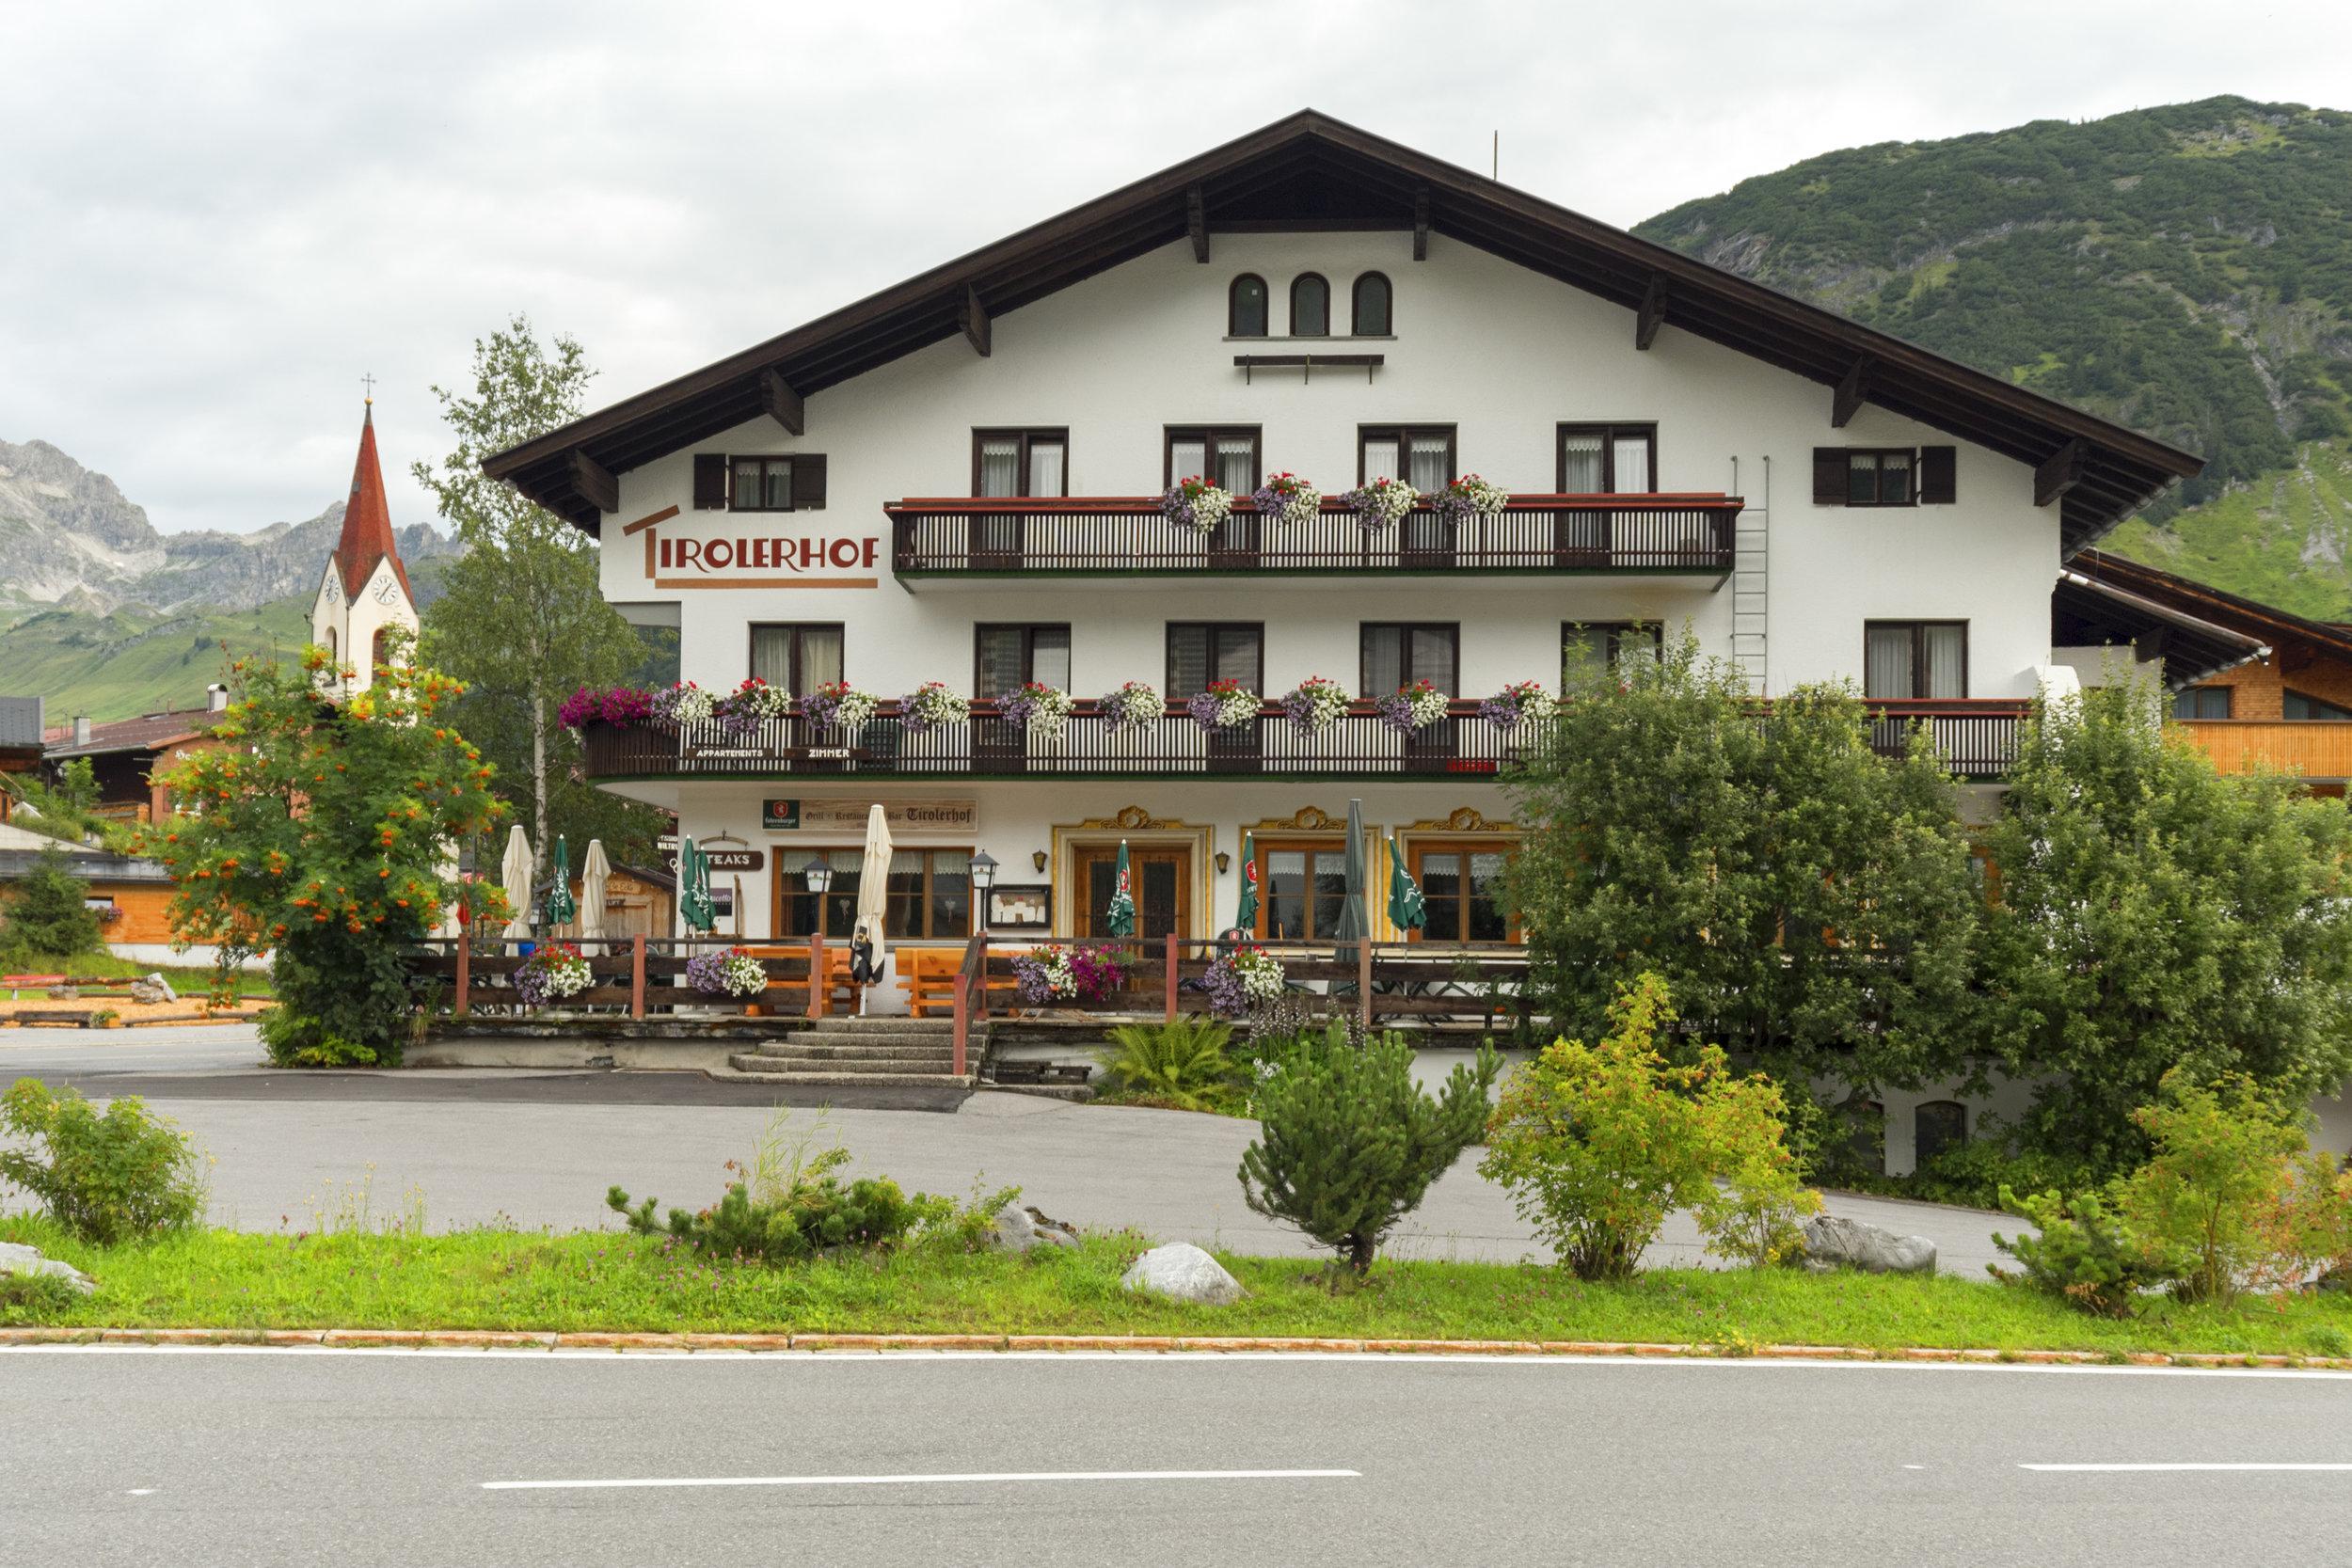 Hotelerie -